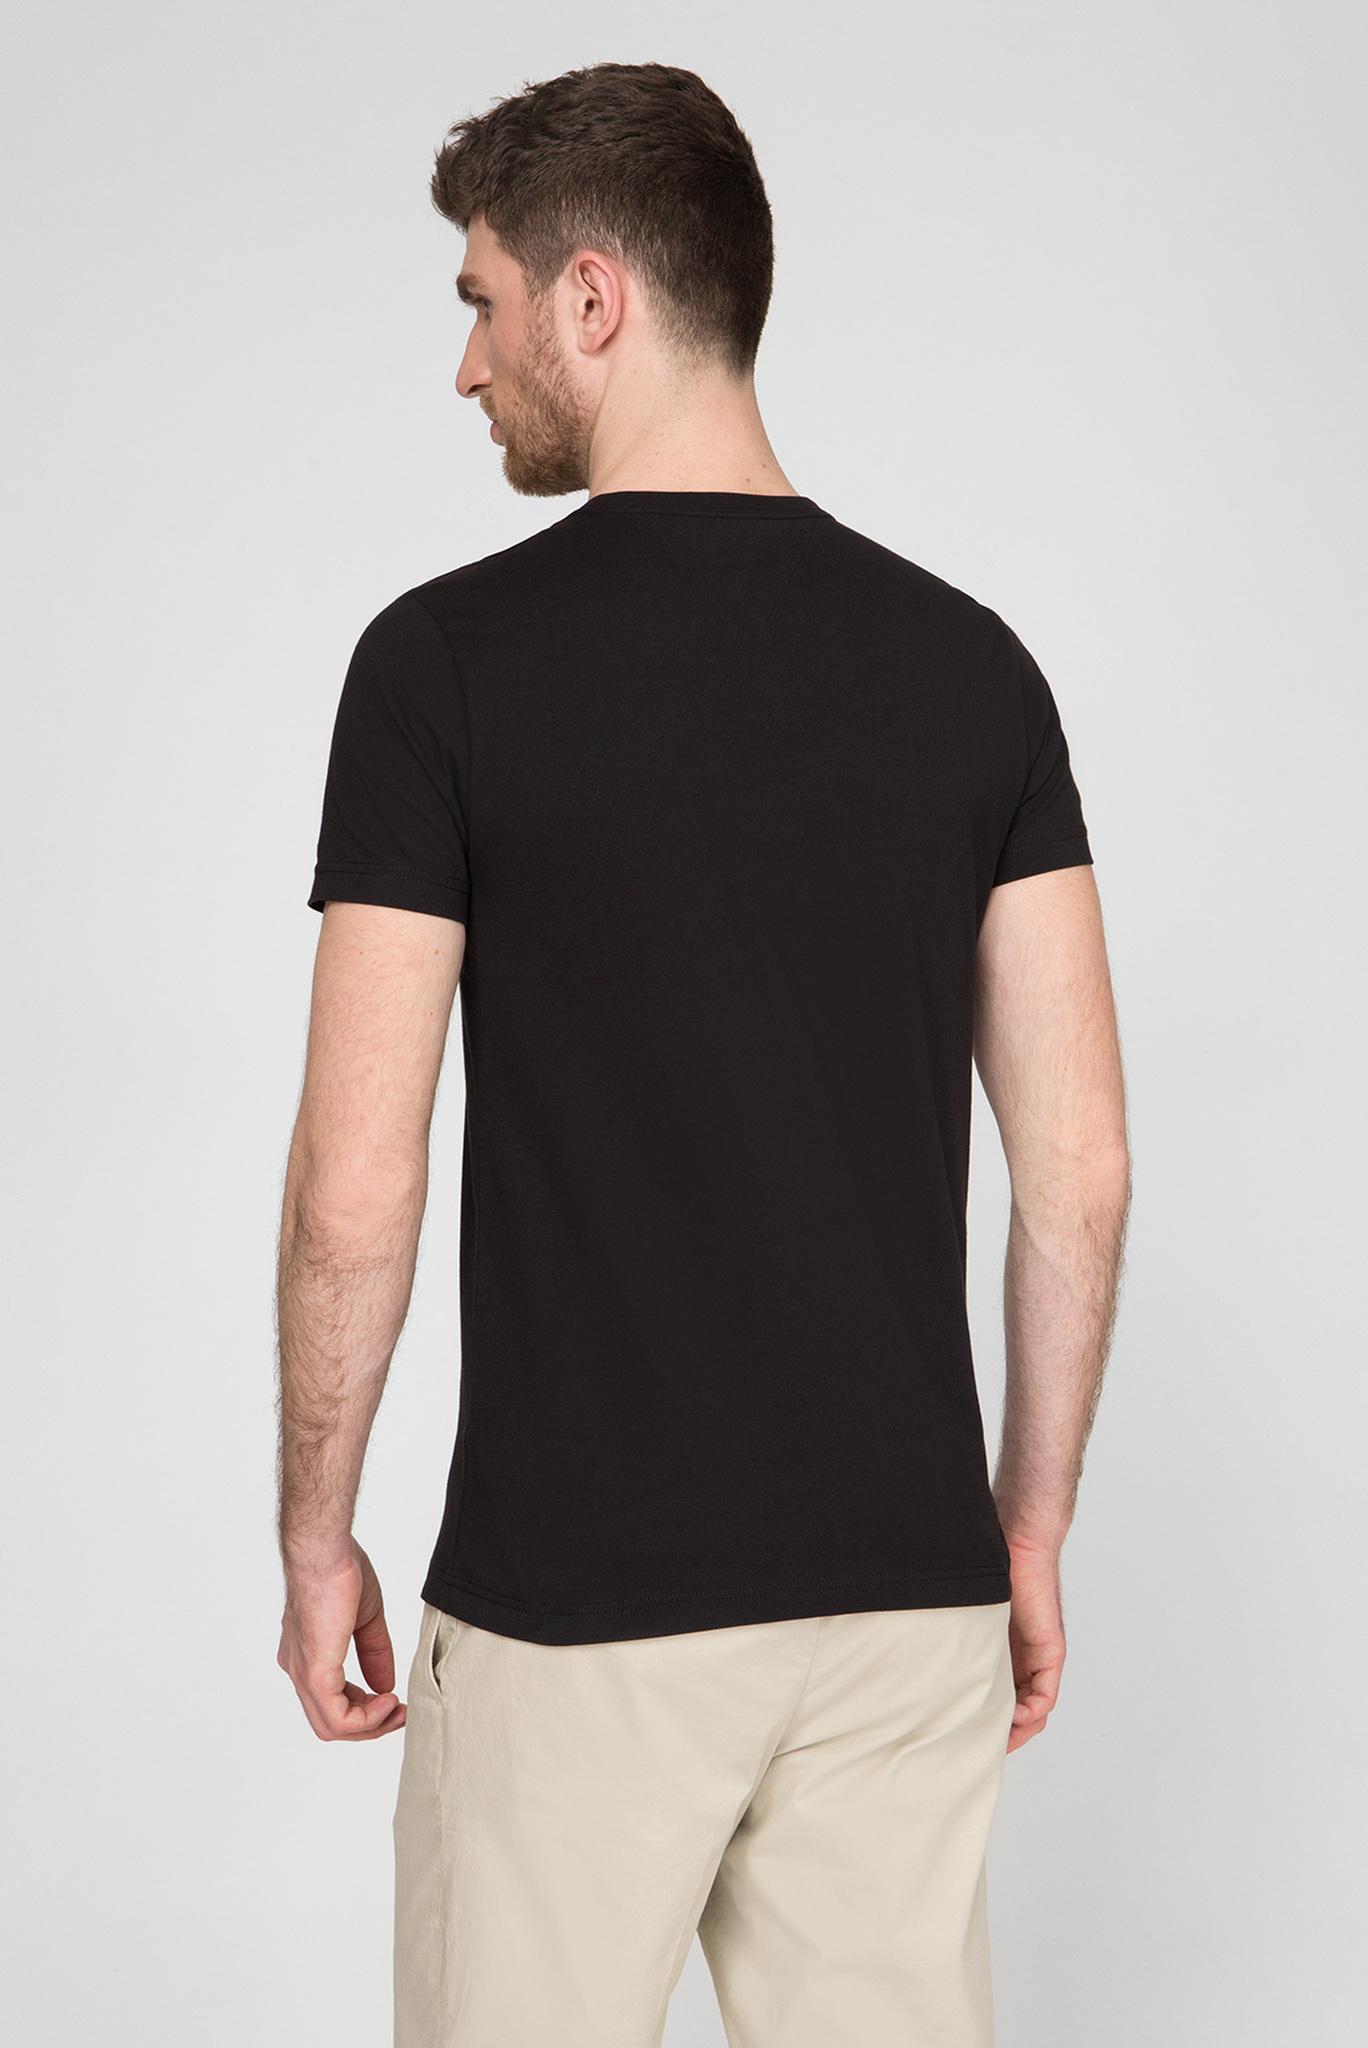 Мужская черная футболка ESSENTIAL COTTON Tommy Hilfiger